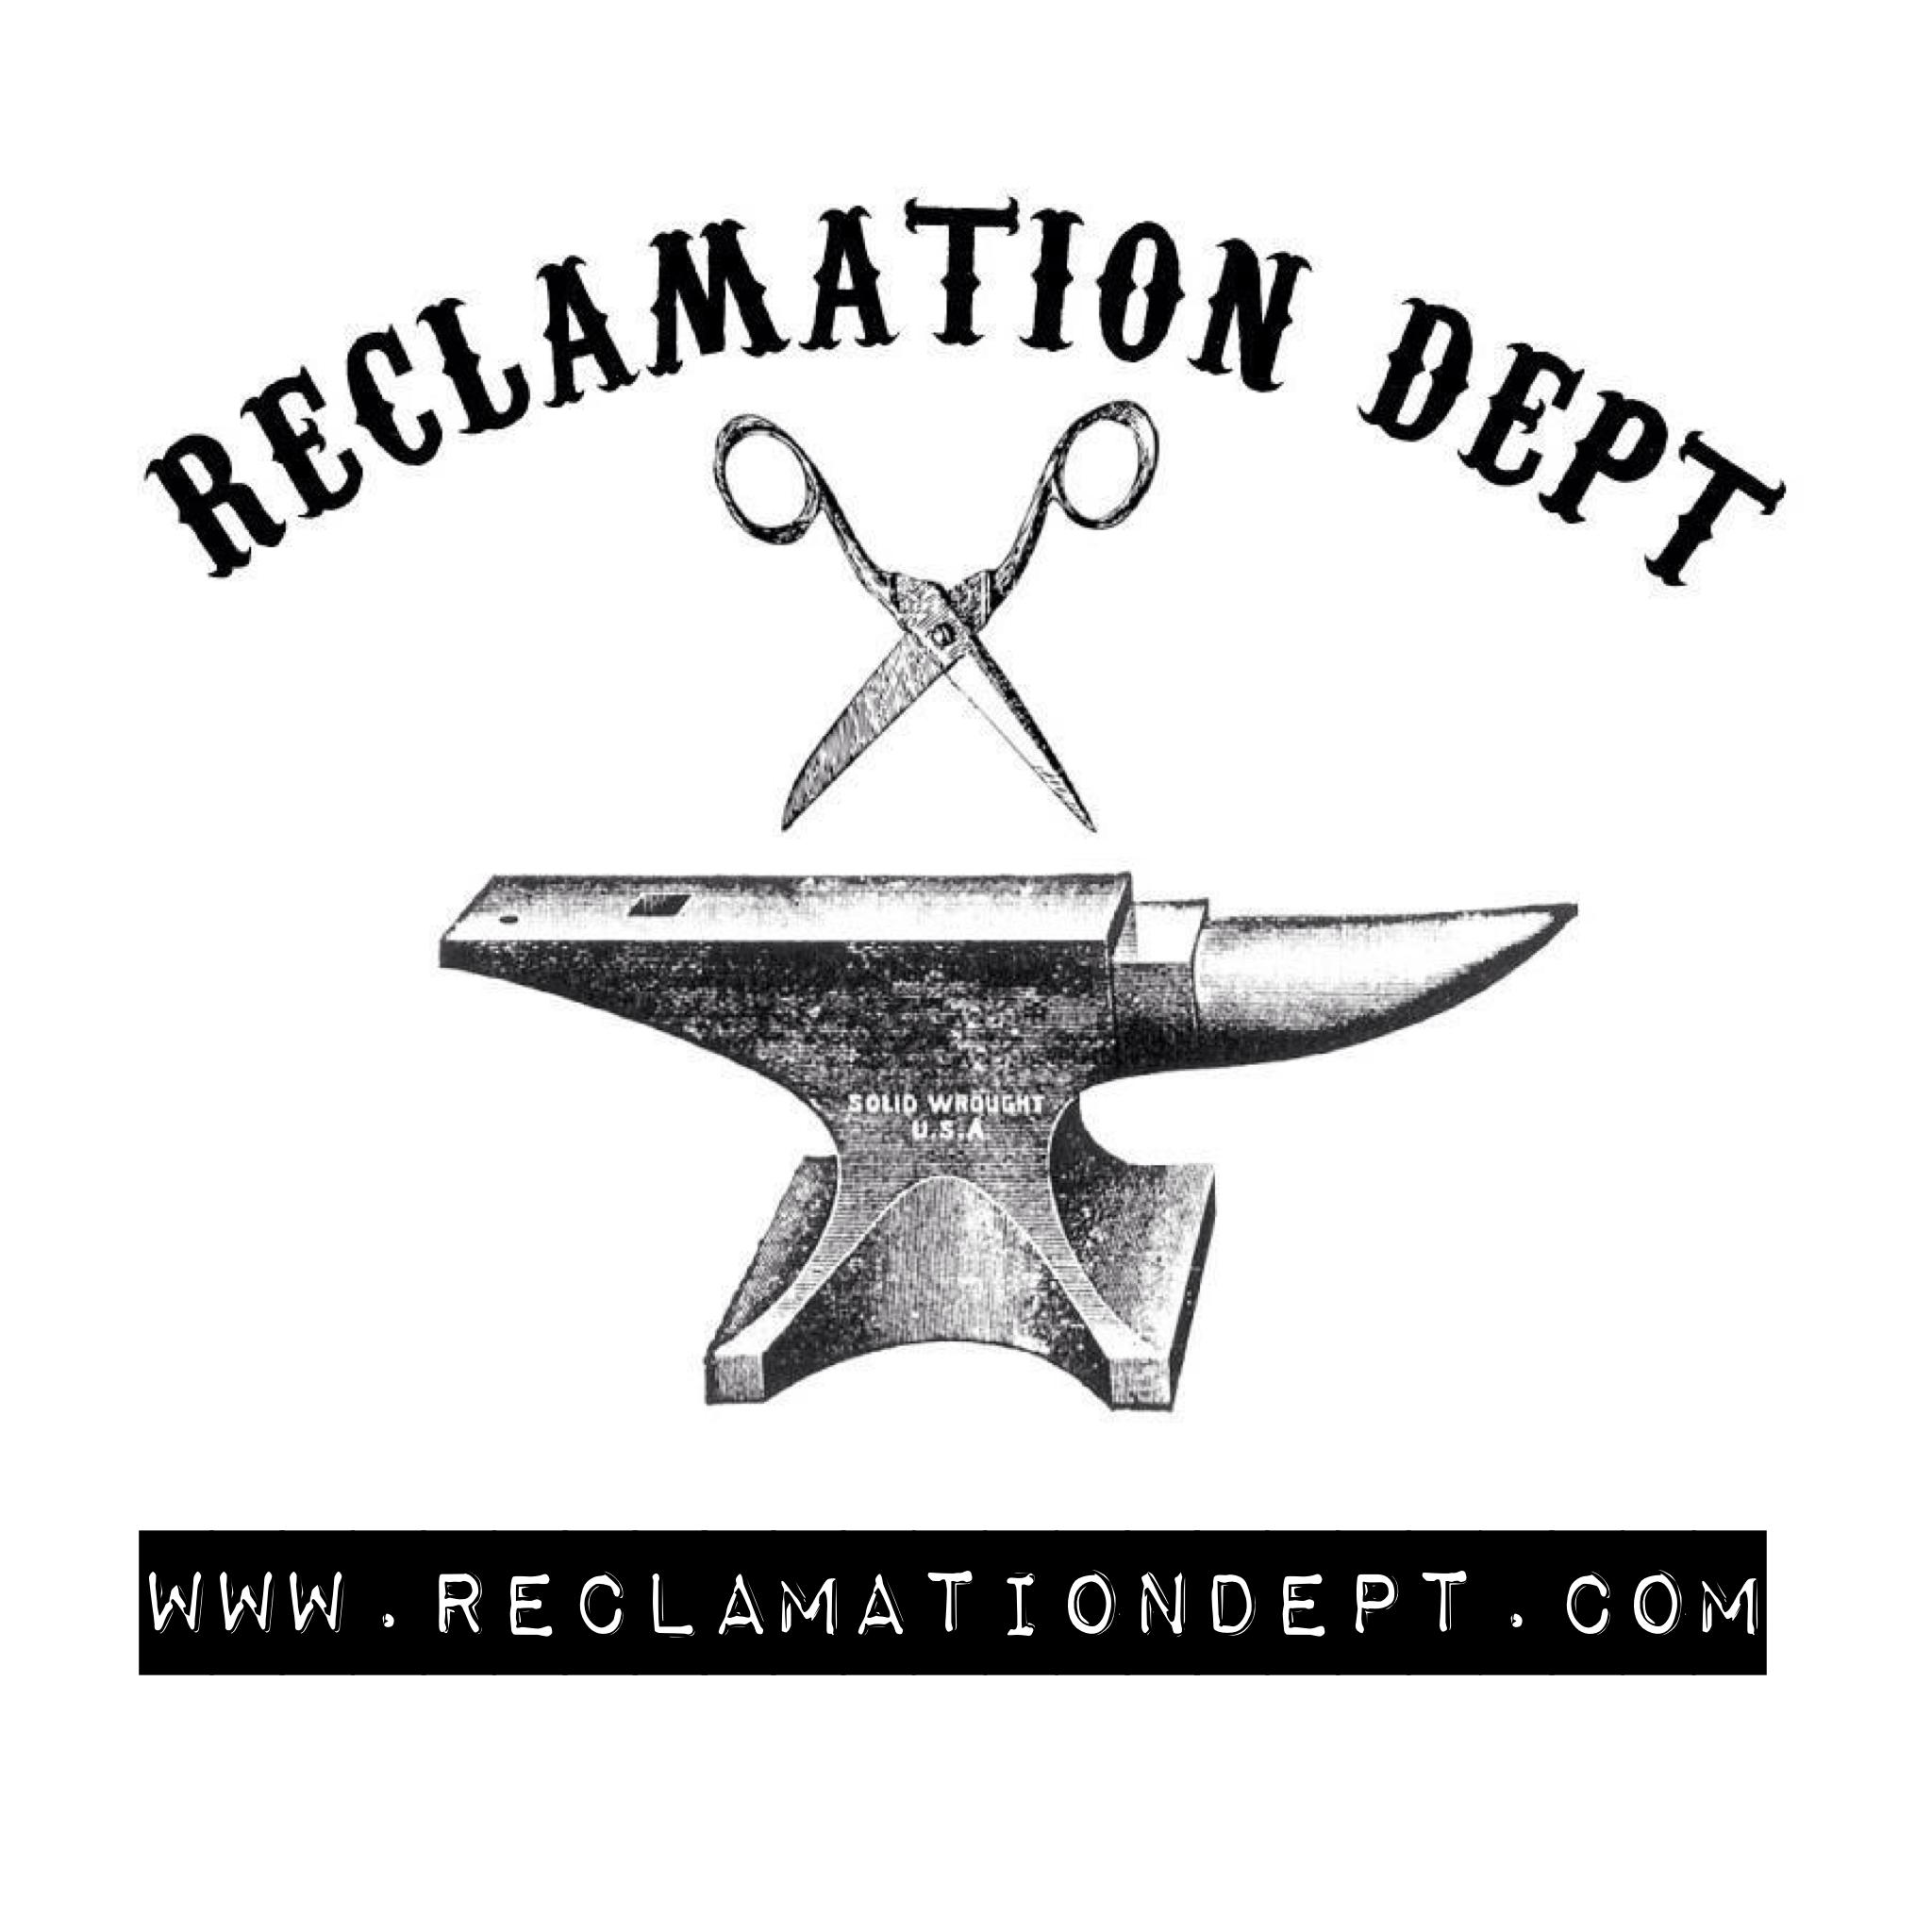 Reclamation Dept